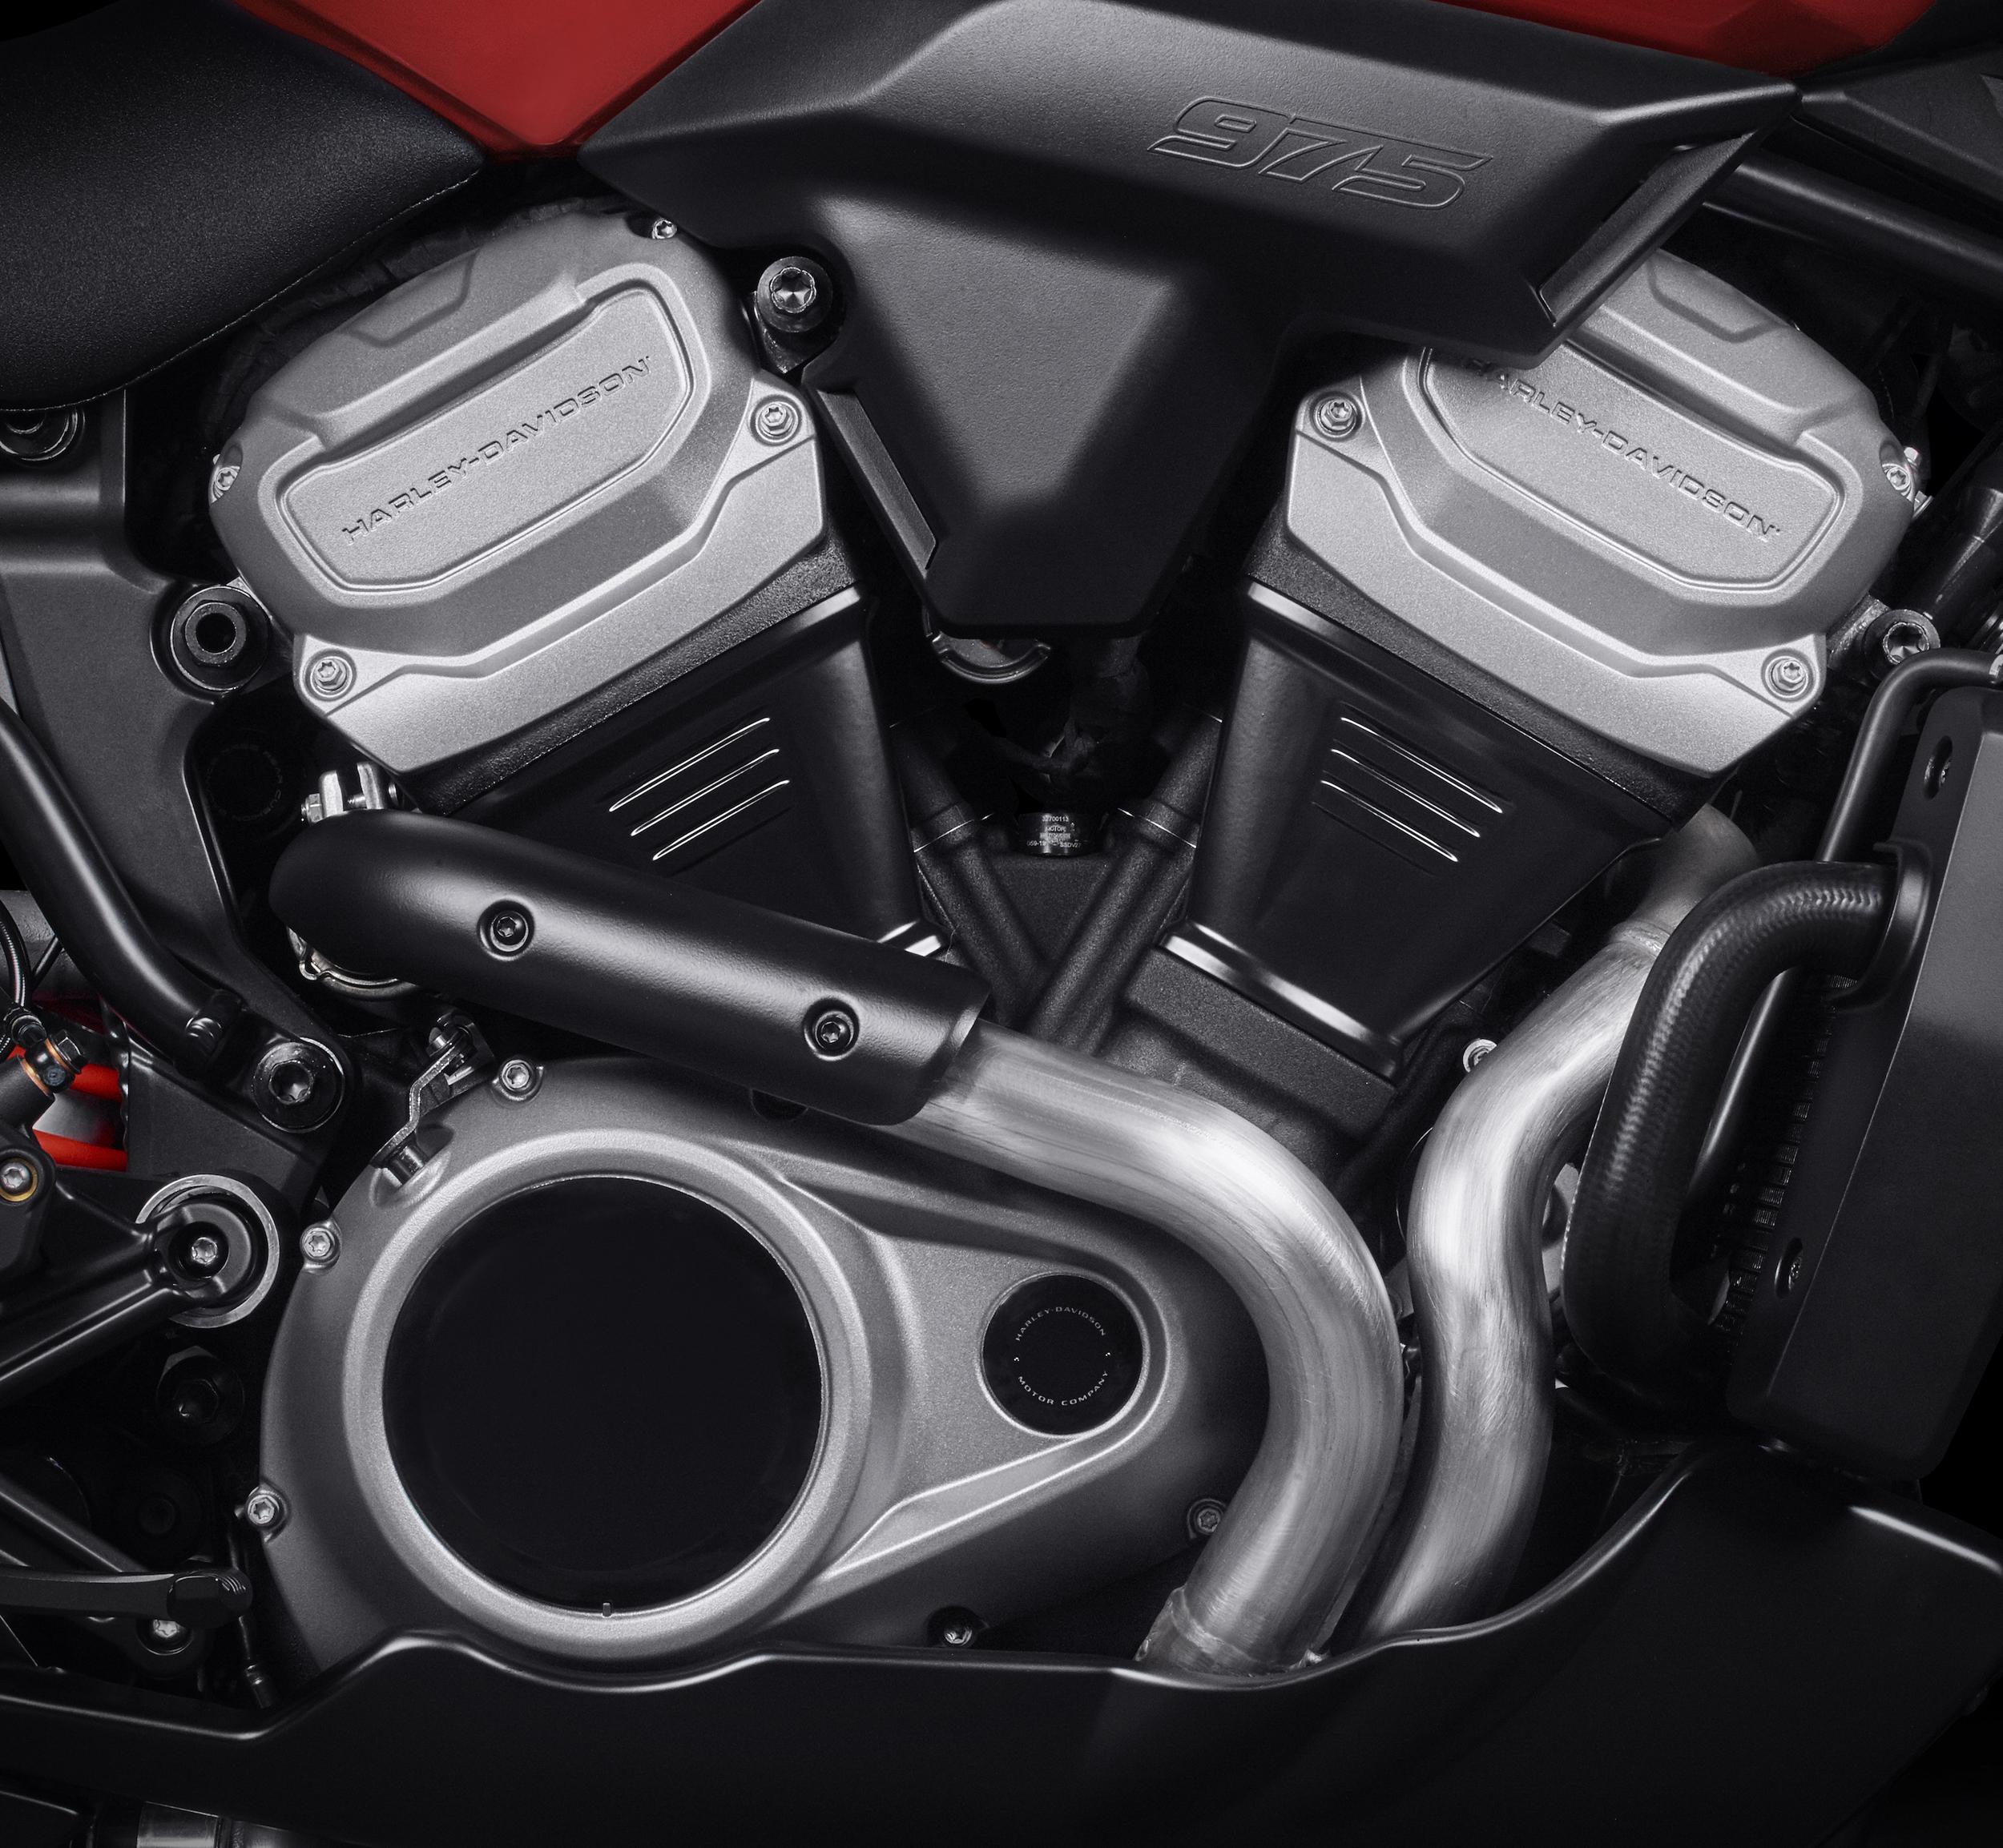 Harley-Davidson Revolution Max 975 engine